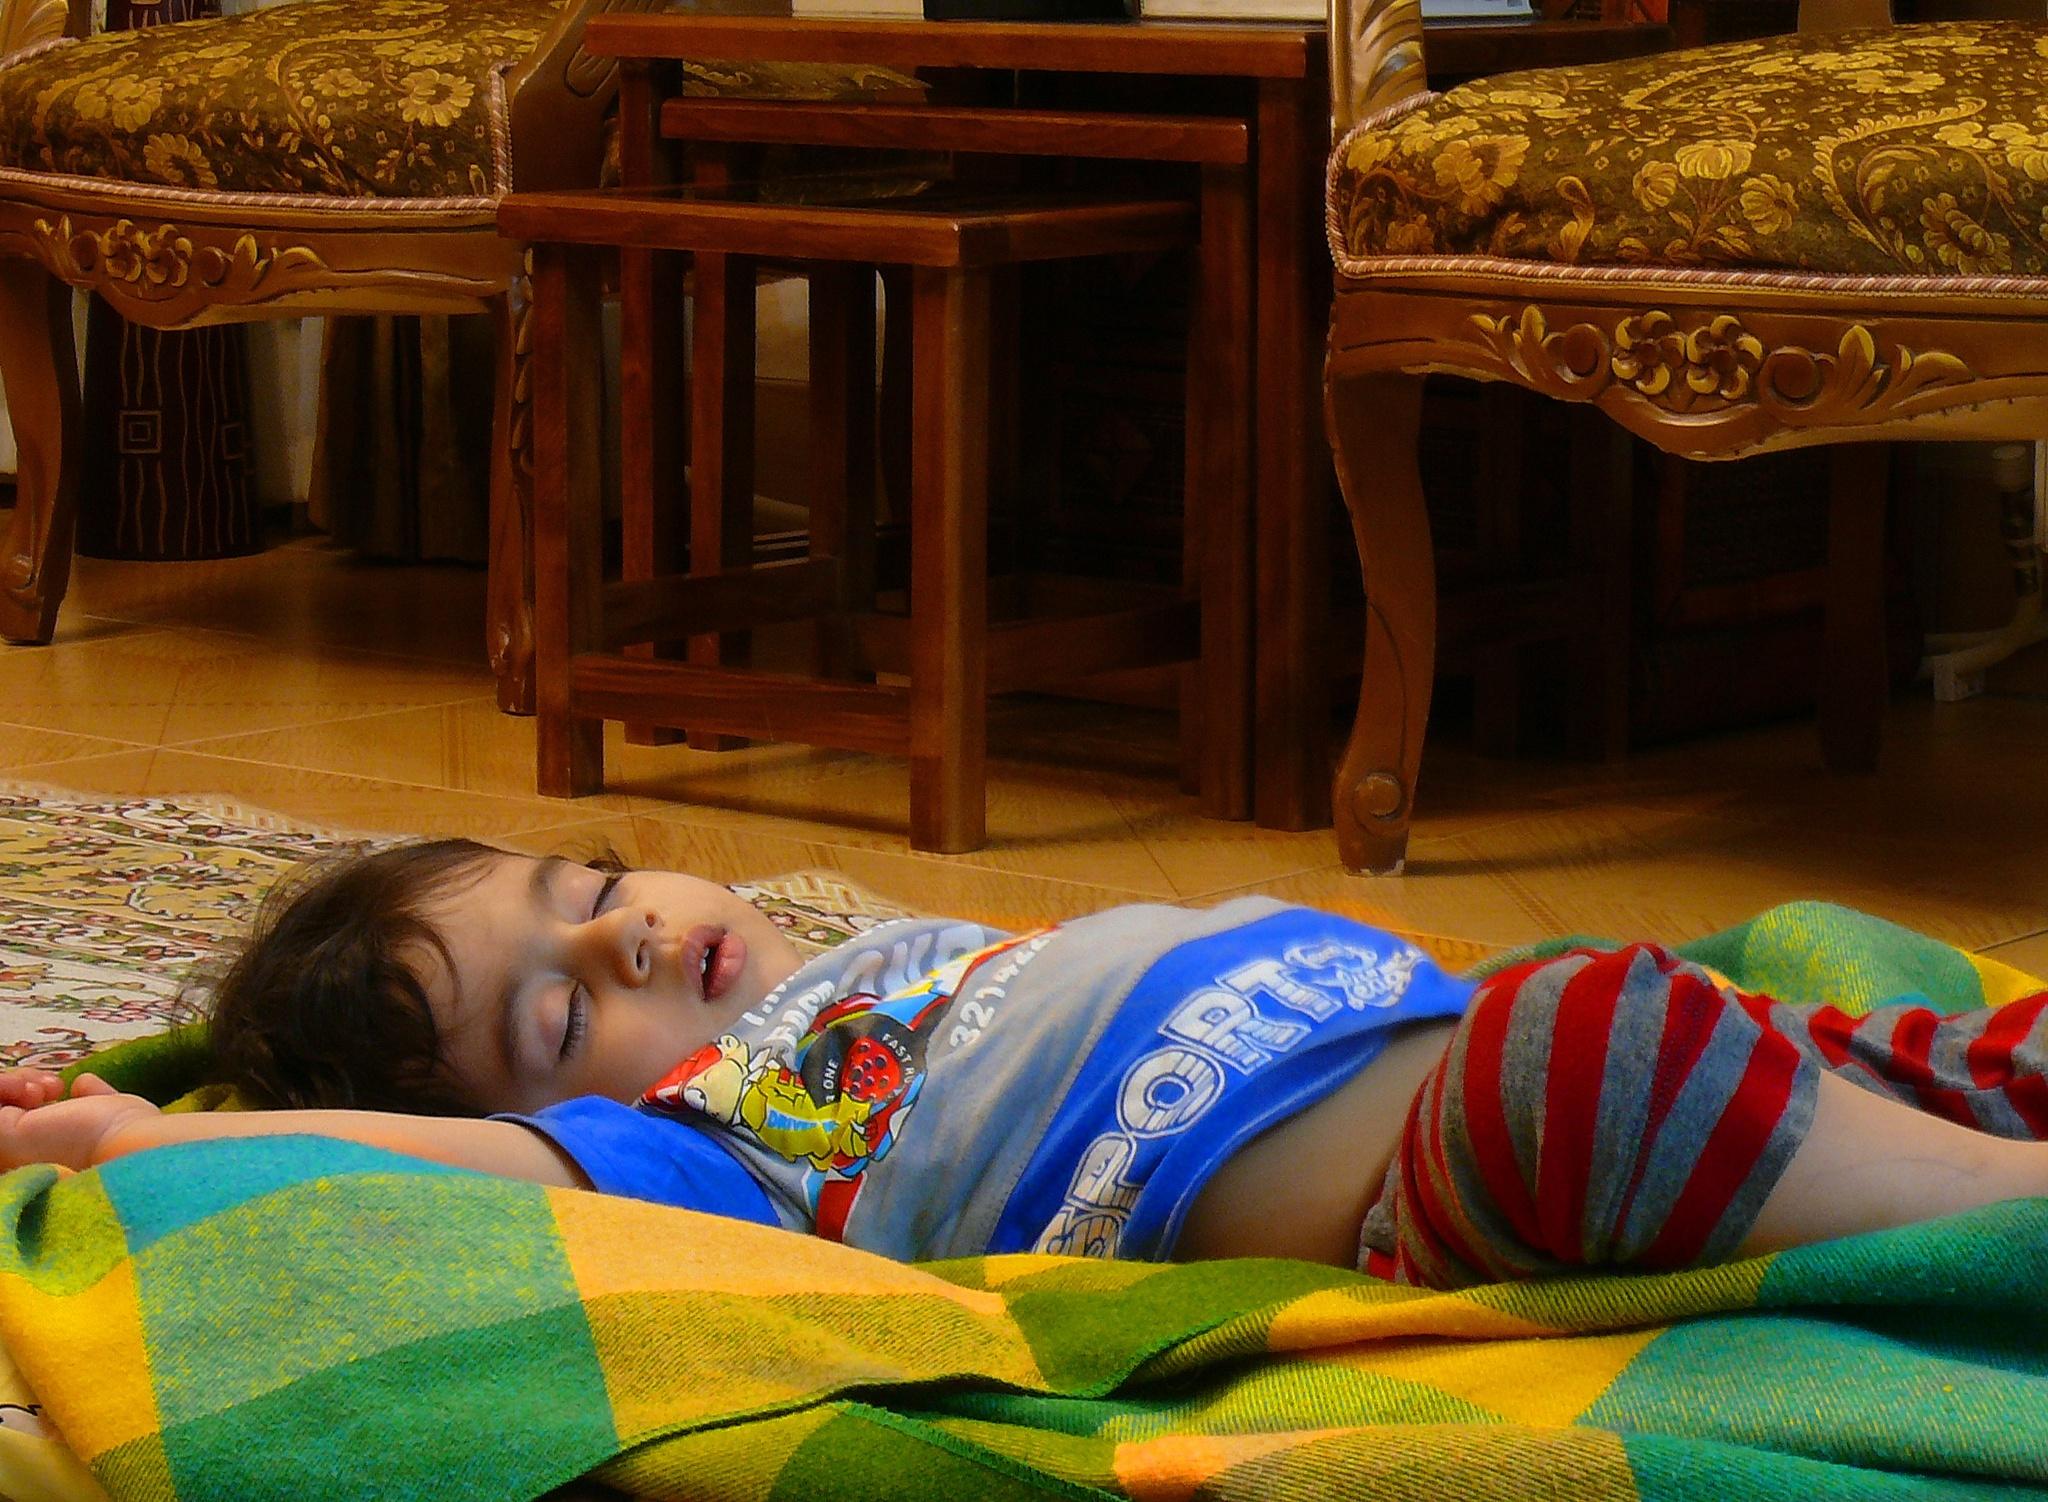 Comfortable sleep by Aahmad Hezavei